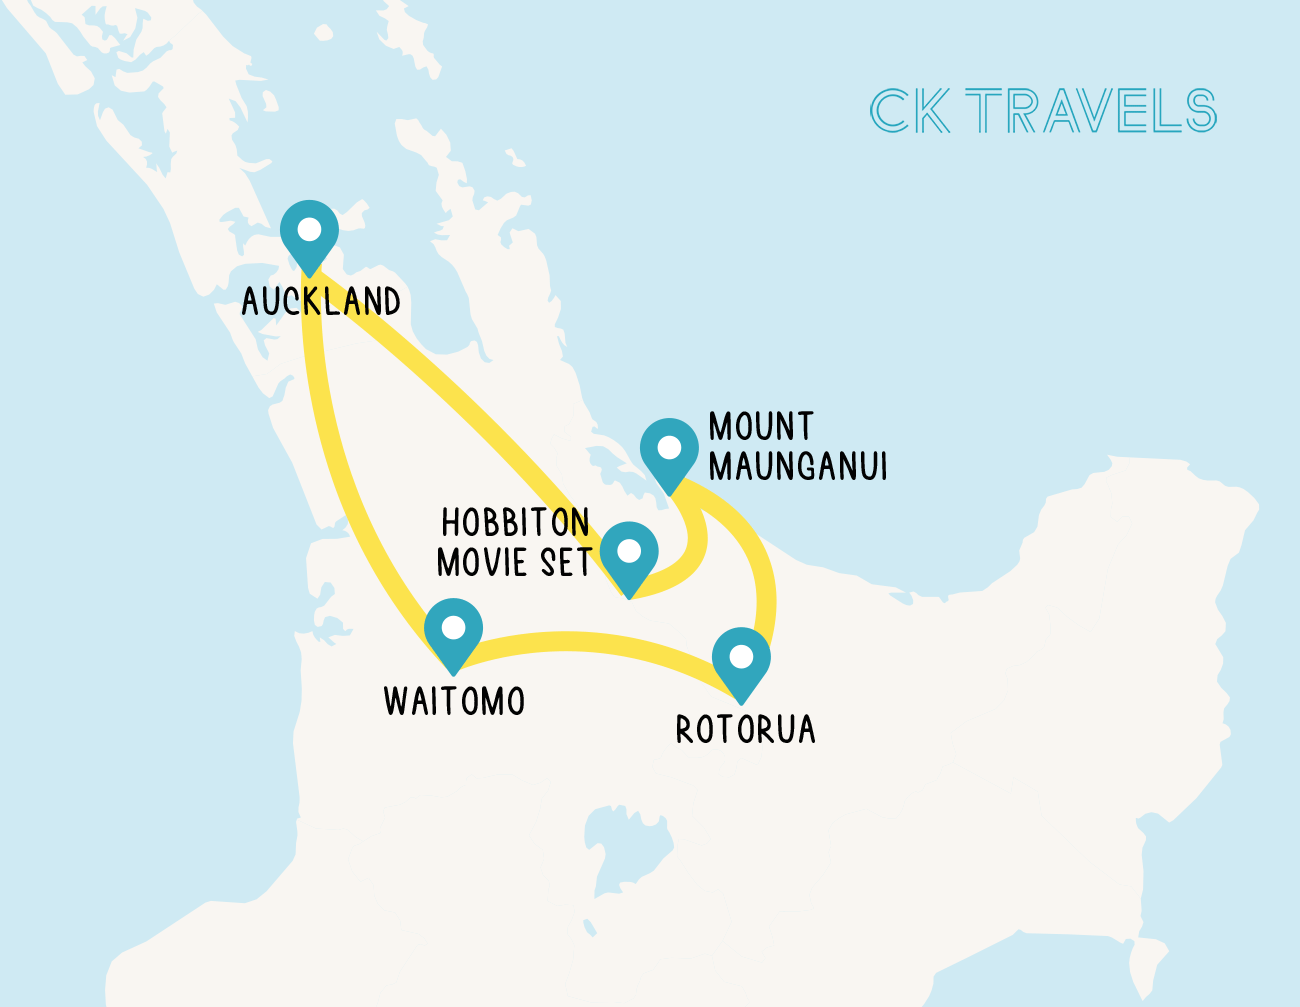 Auckland to Rotorua drive itinerary map north island